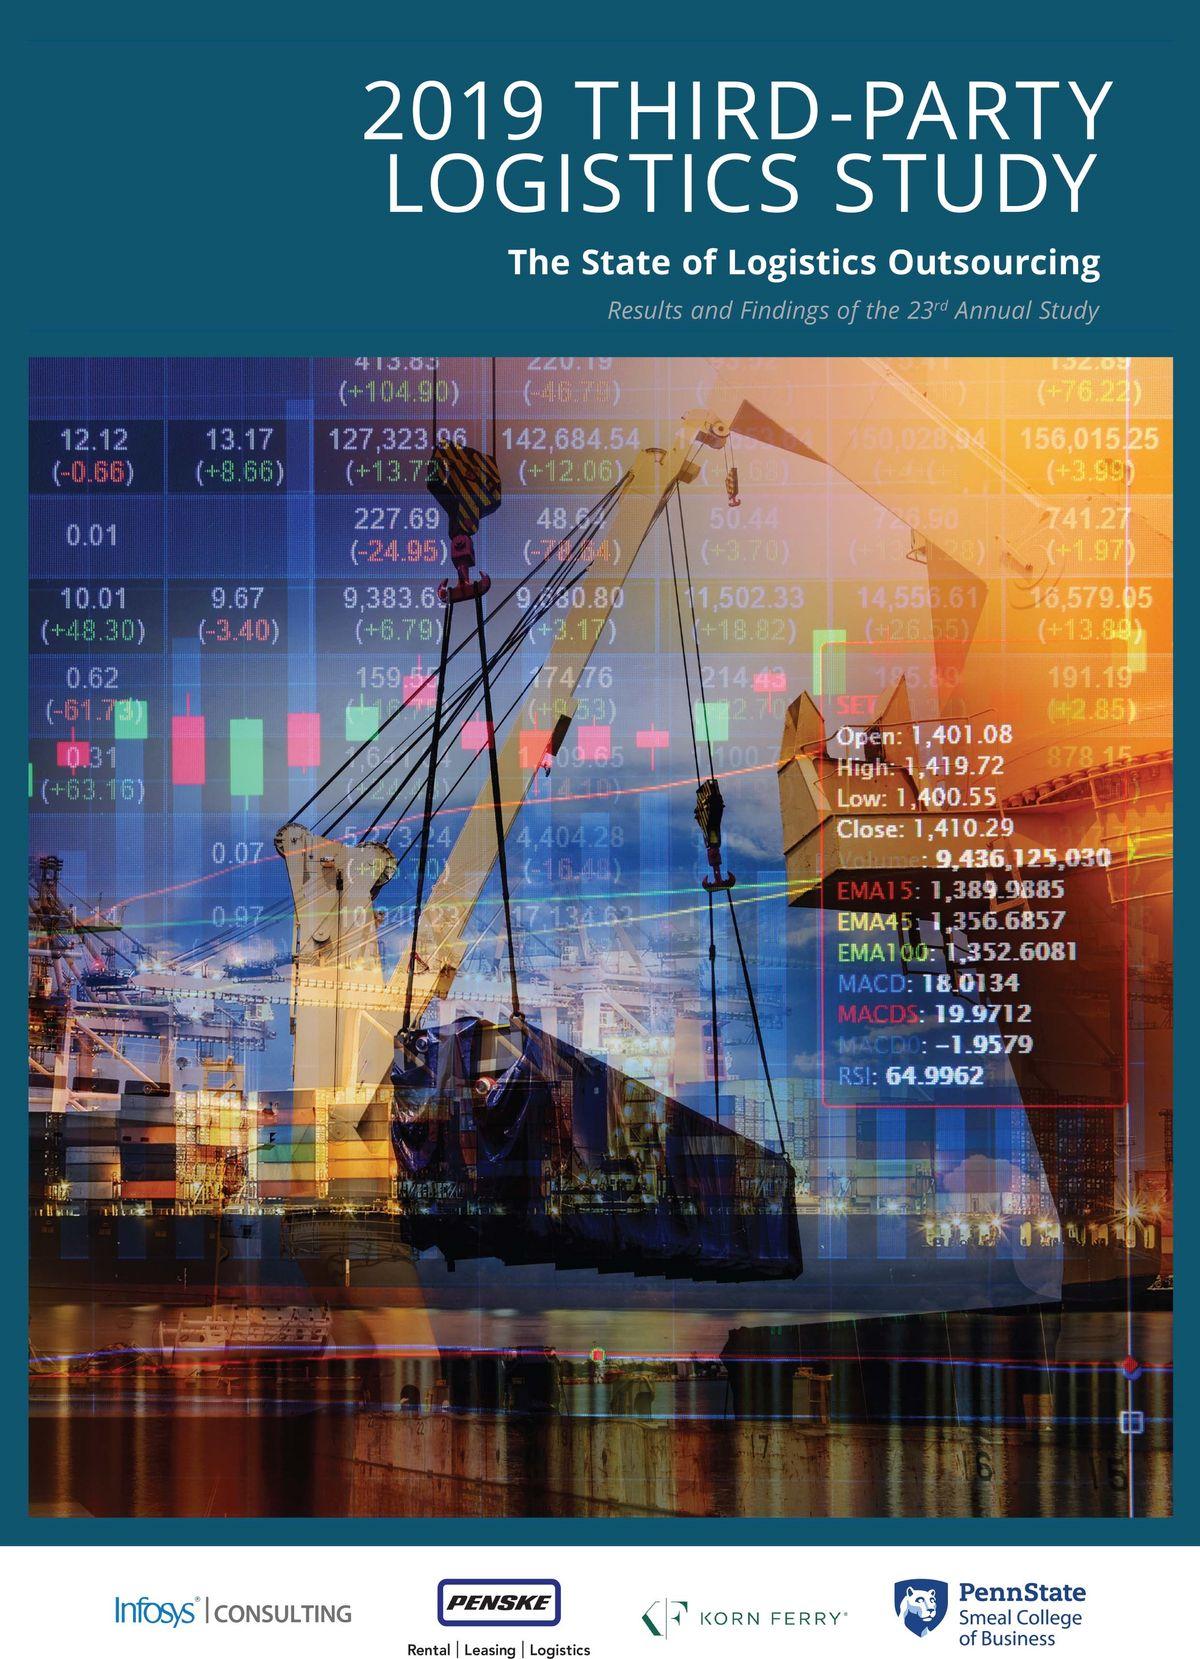 Penske Logistics Presents 2019 Third-Party Logistics Study: State of Logistics Outsourcing